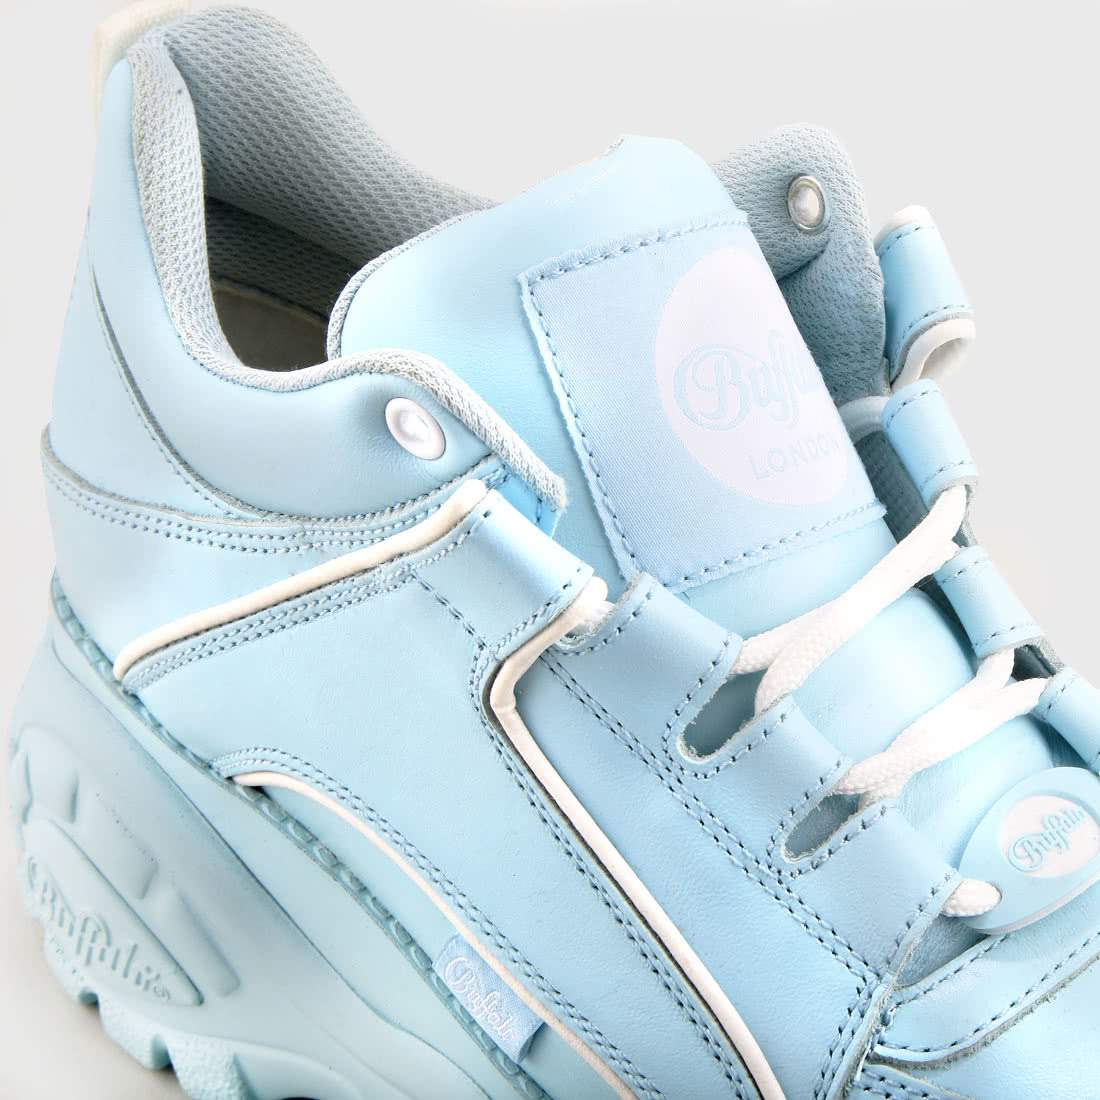 Buffalo London Classic Boots Shoes Plateau Schuhe 90er Marino Blau